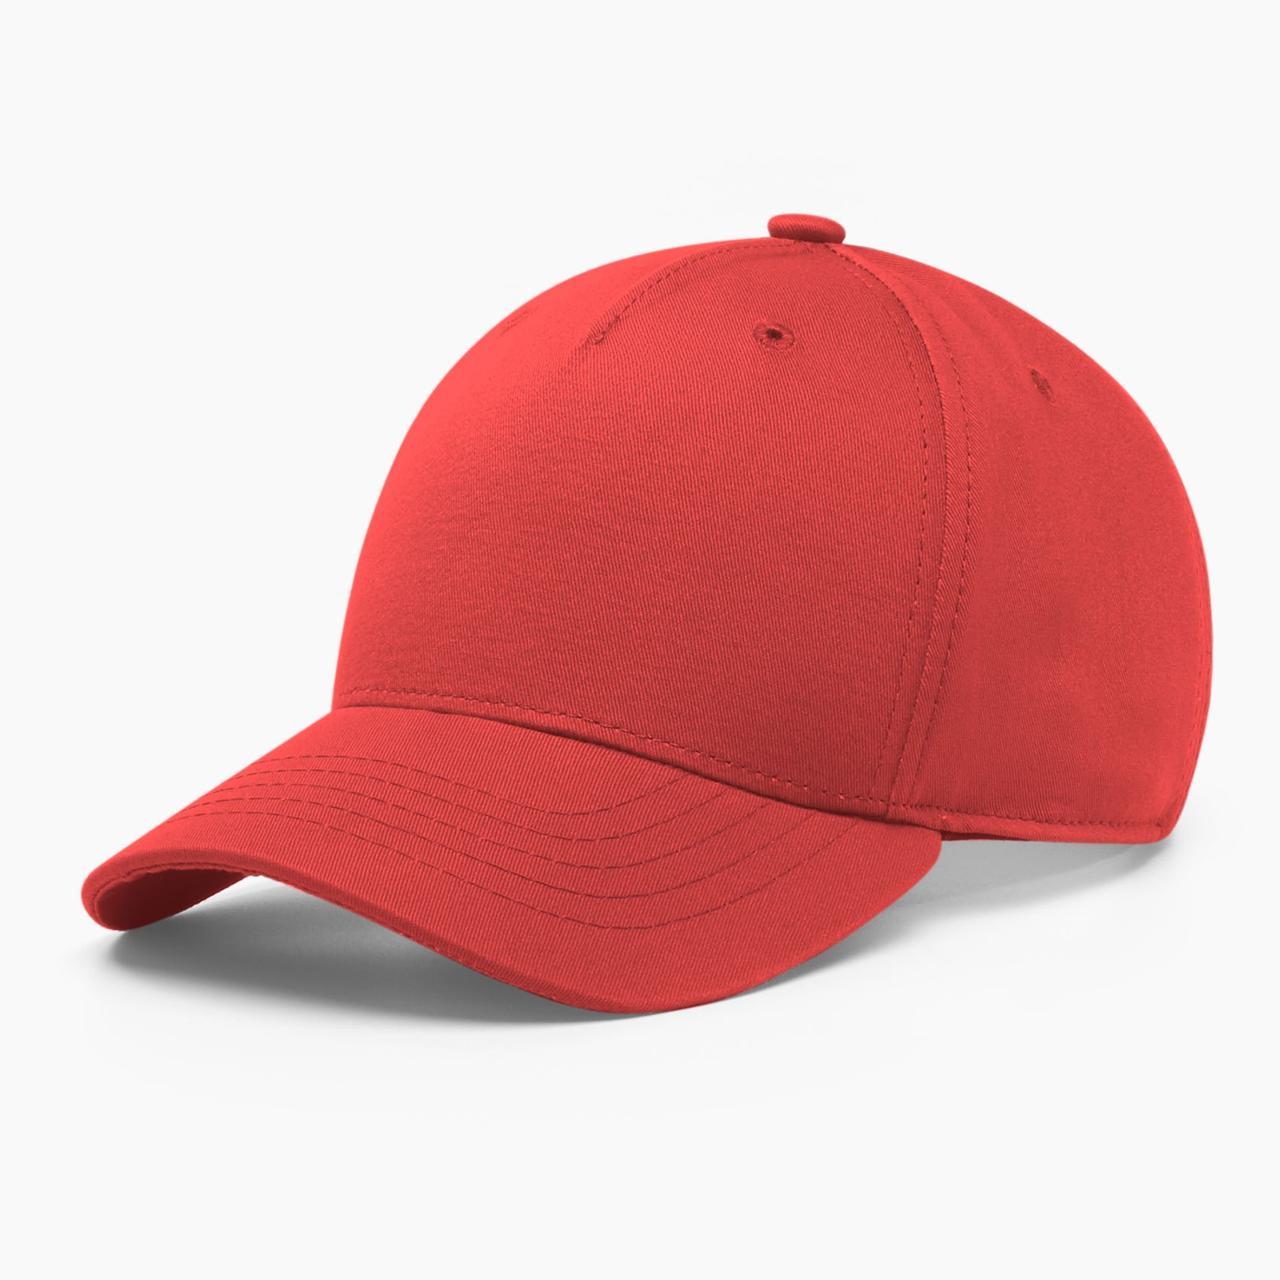 Бейсболка без логотипа INAL basic S / 53-54 RU Красный 204553